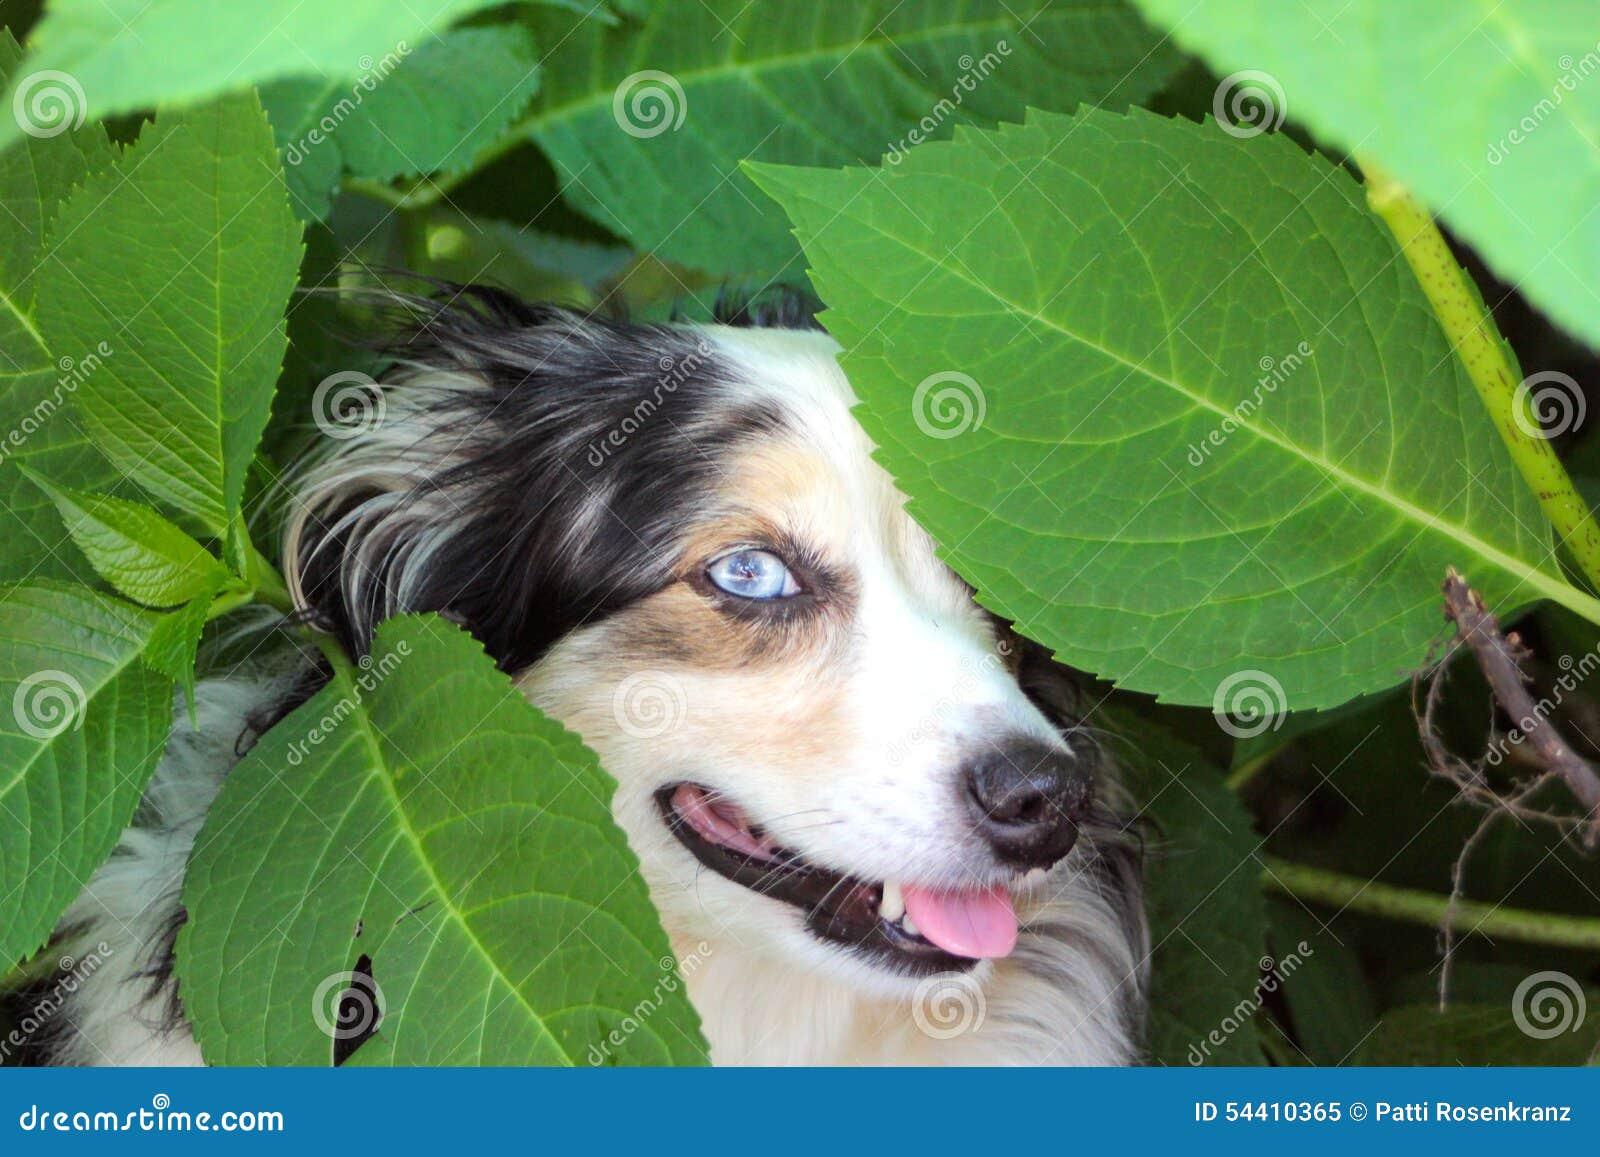 Dog Playing Peek A Boo